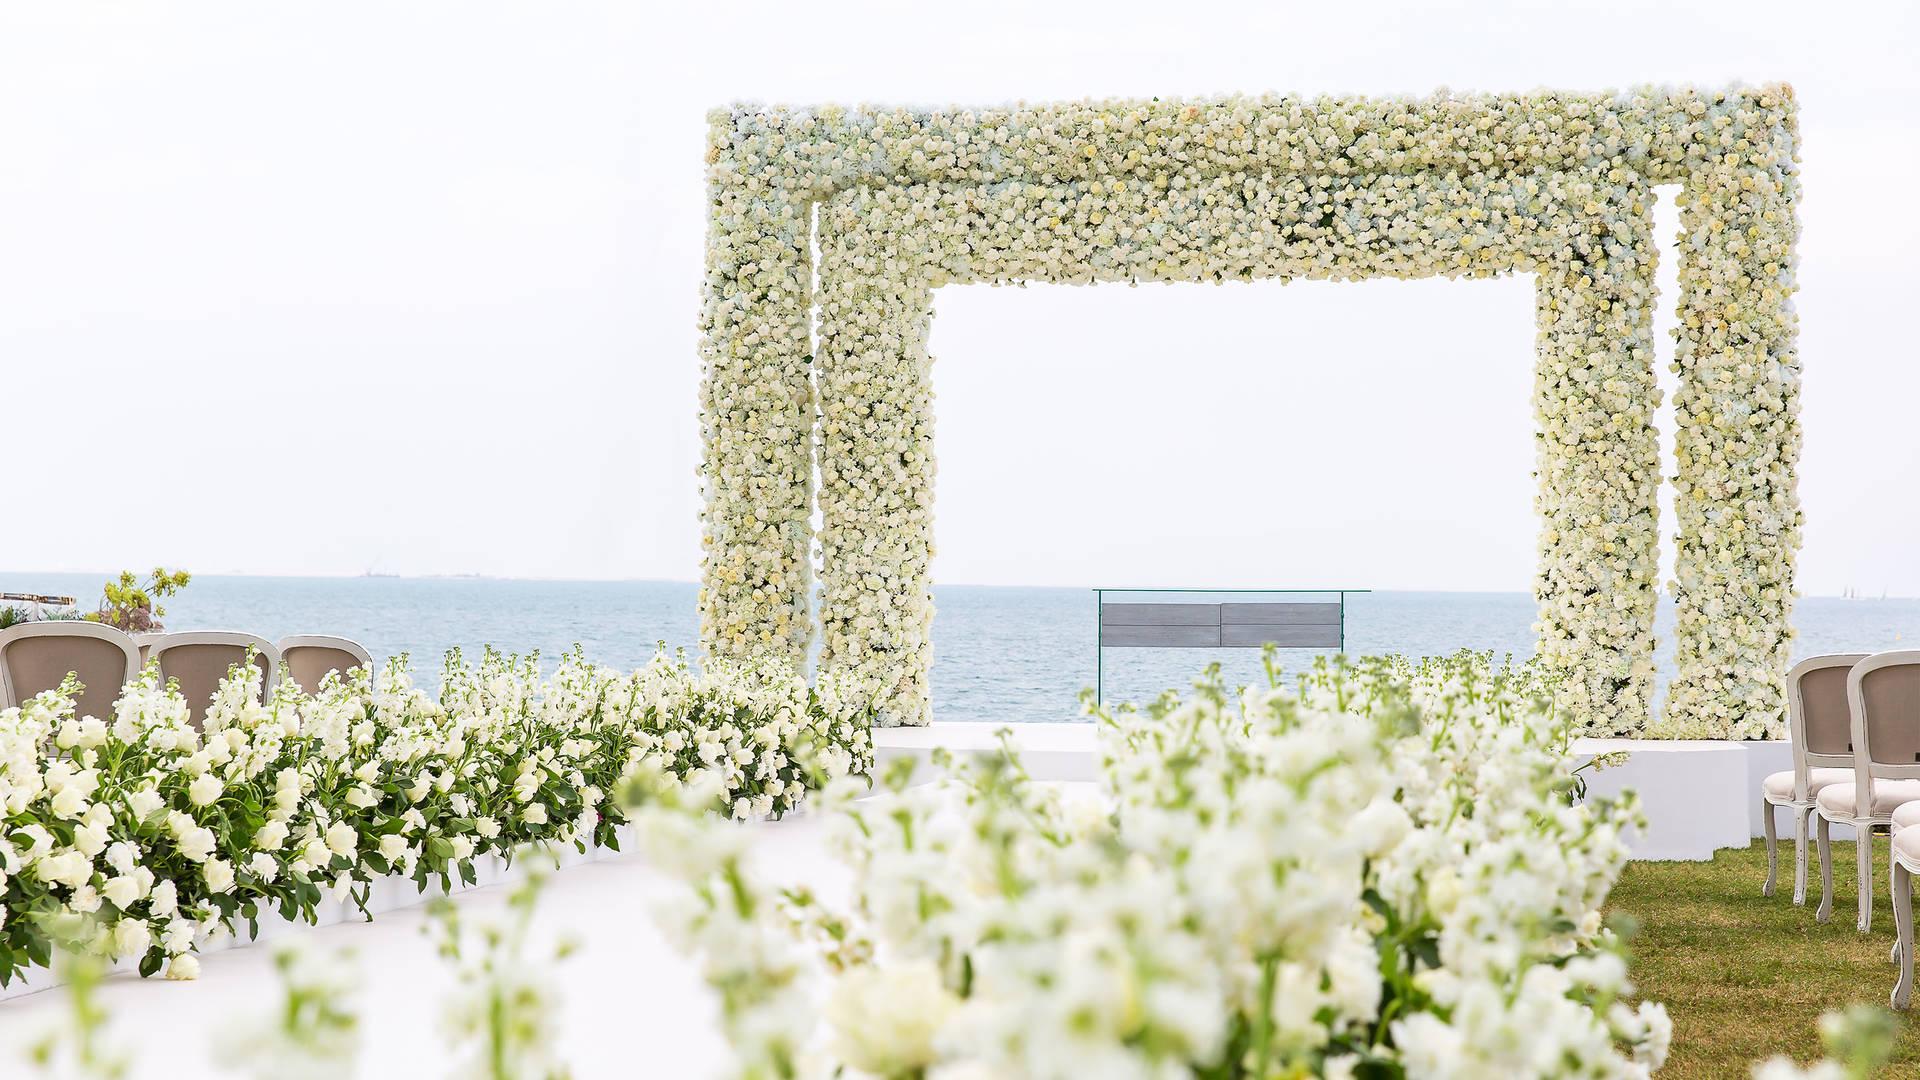 Burj Al Arab Jumeirah Palm Garden Wedding